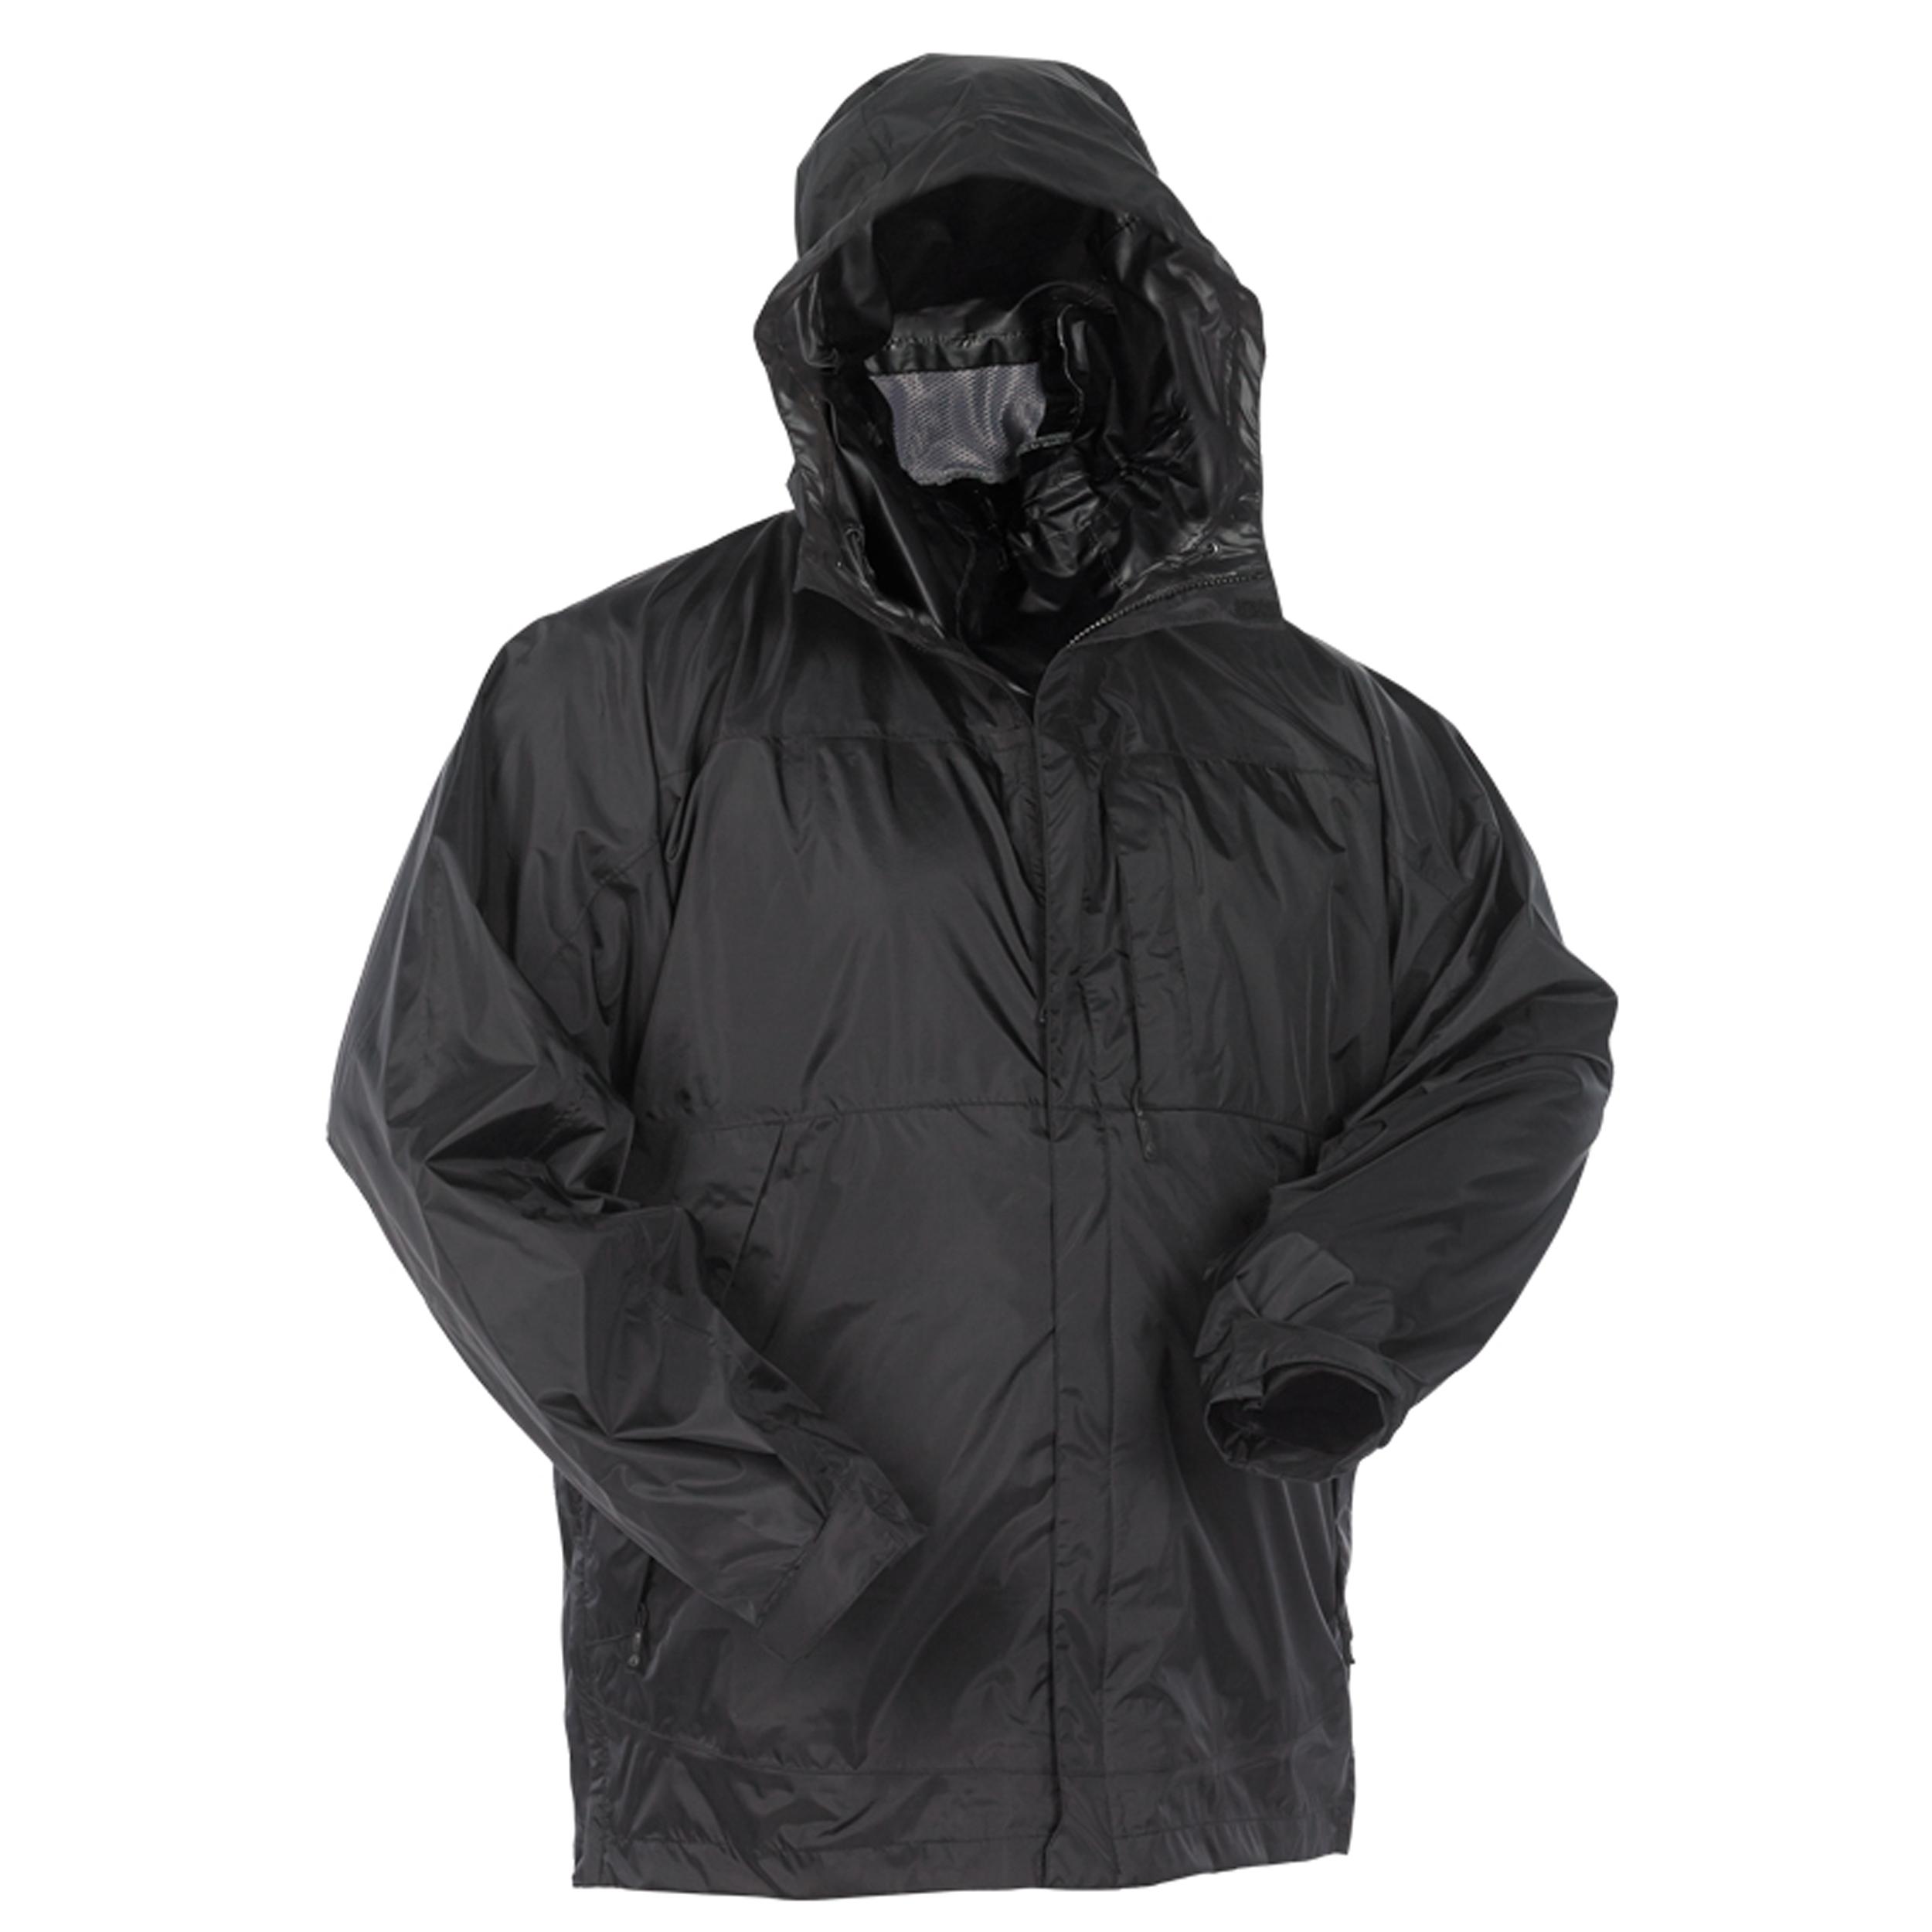 Snugpak Rj1 Rain Jacket Black Lg